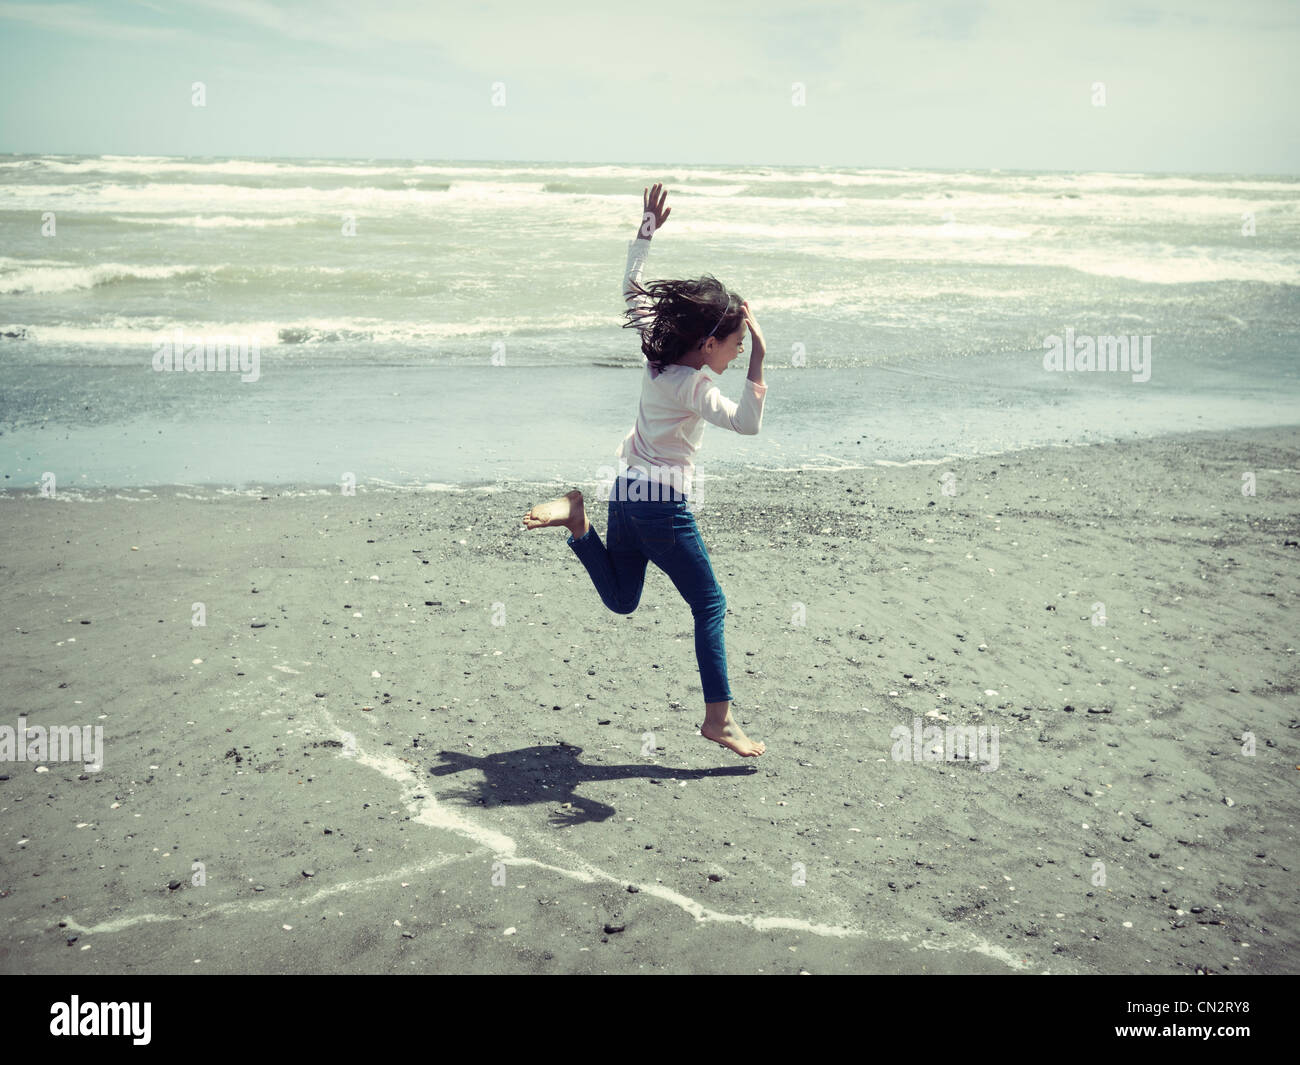 Girl jumps at beach. - Stock Image